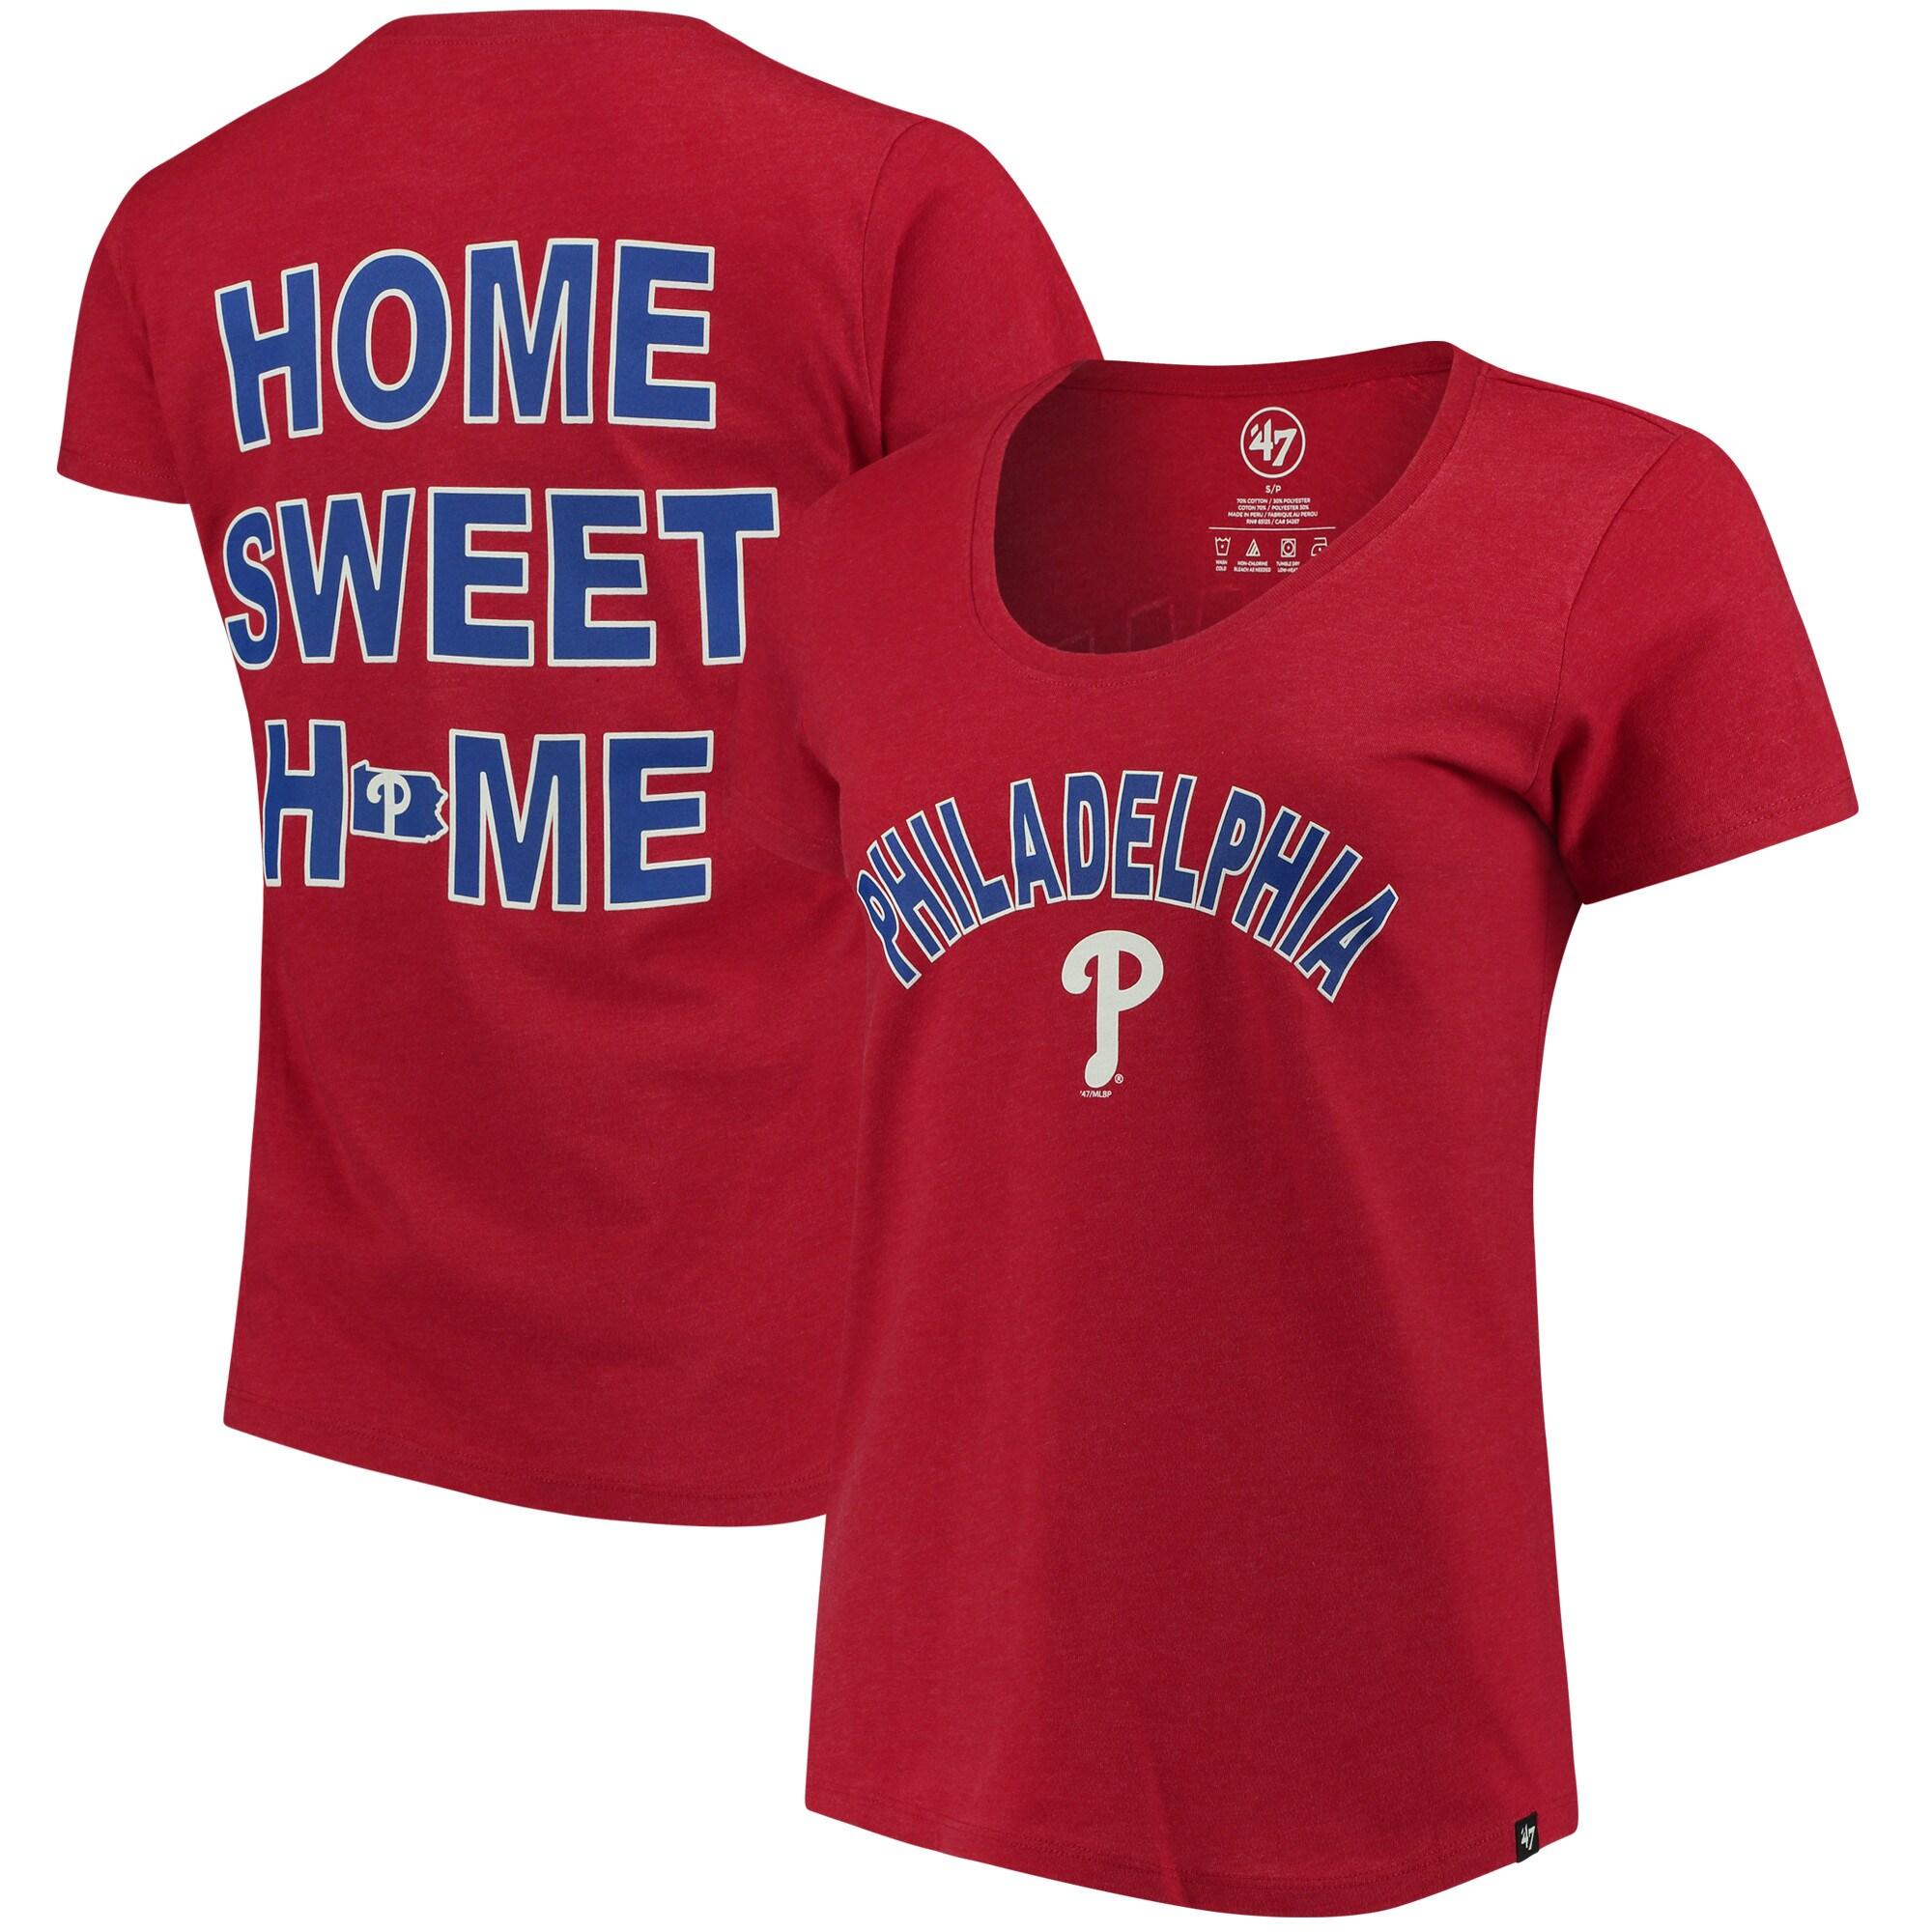 Philadelphia Phillies '47 Women's Club Scoop Neck T-Shirt - Red